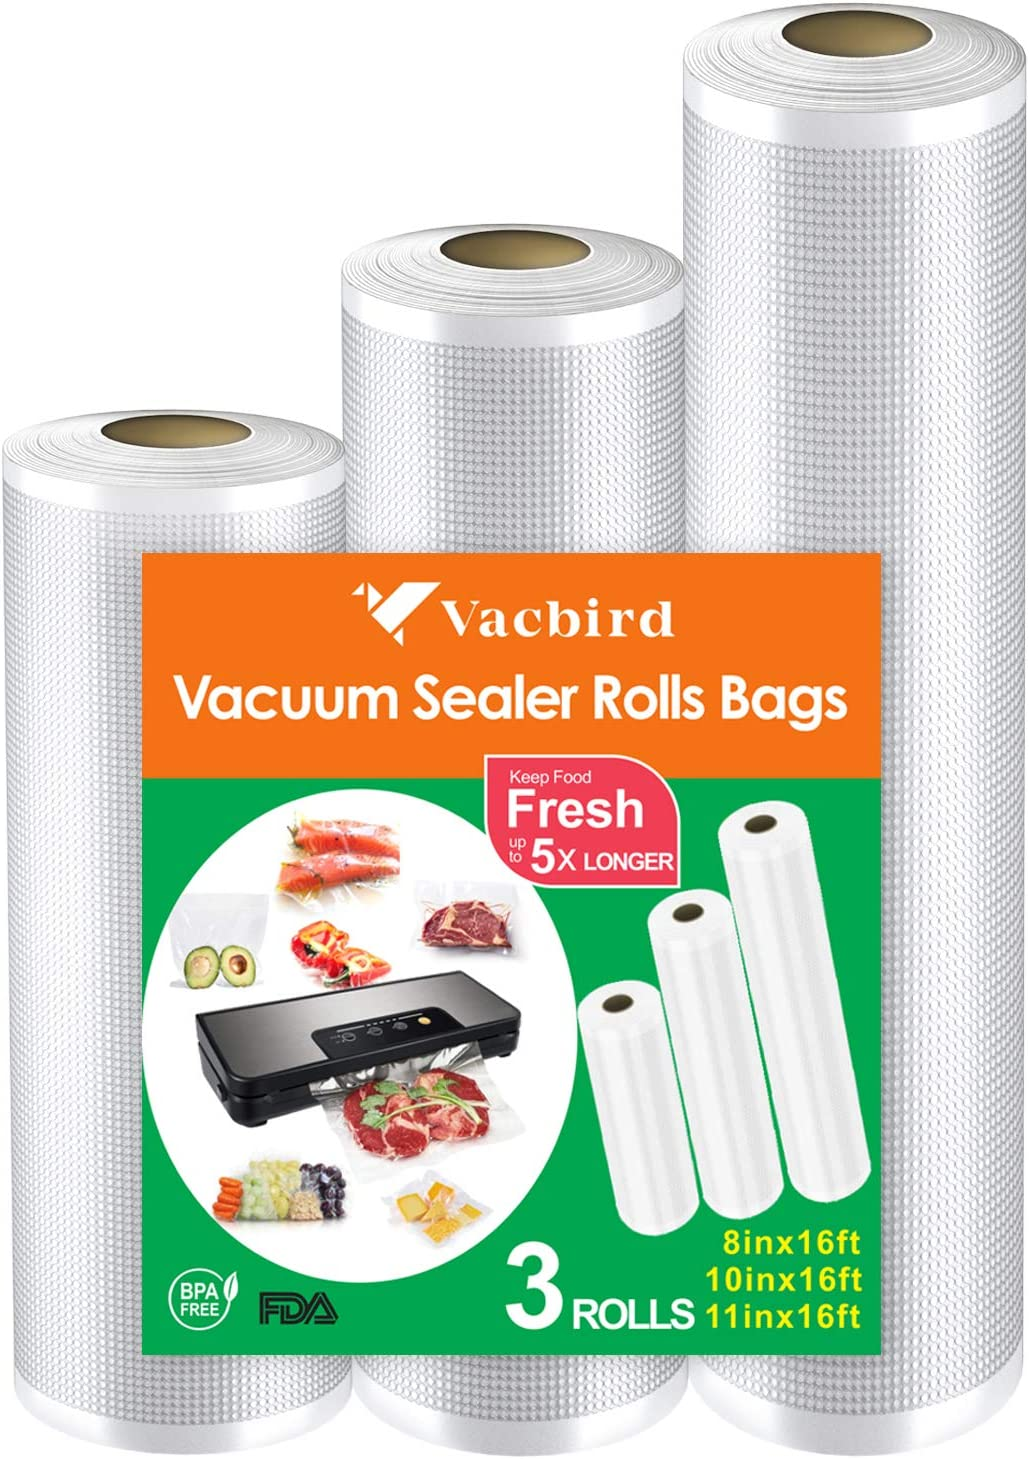 "Vacuum Seal Rolls Bags, Vacbird BPA-Free Vacuum Sealer Bags 3 Rolls 8"" x 16', 10"" x 16', 11"" x 16'for Food Saver, Meal Prep or Sous Vide"